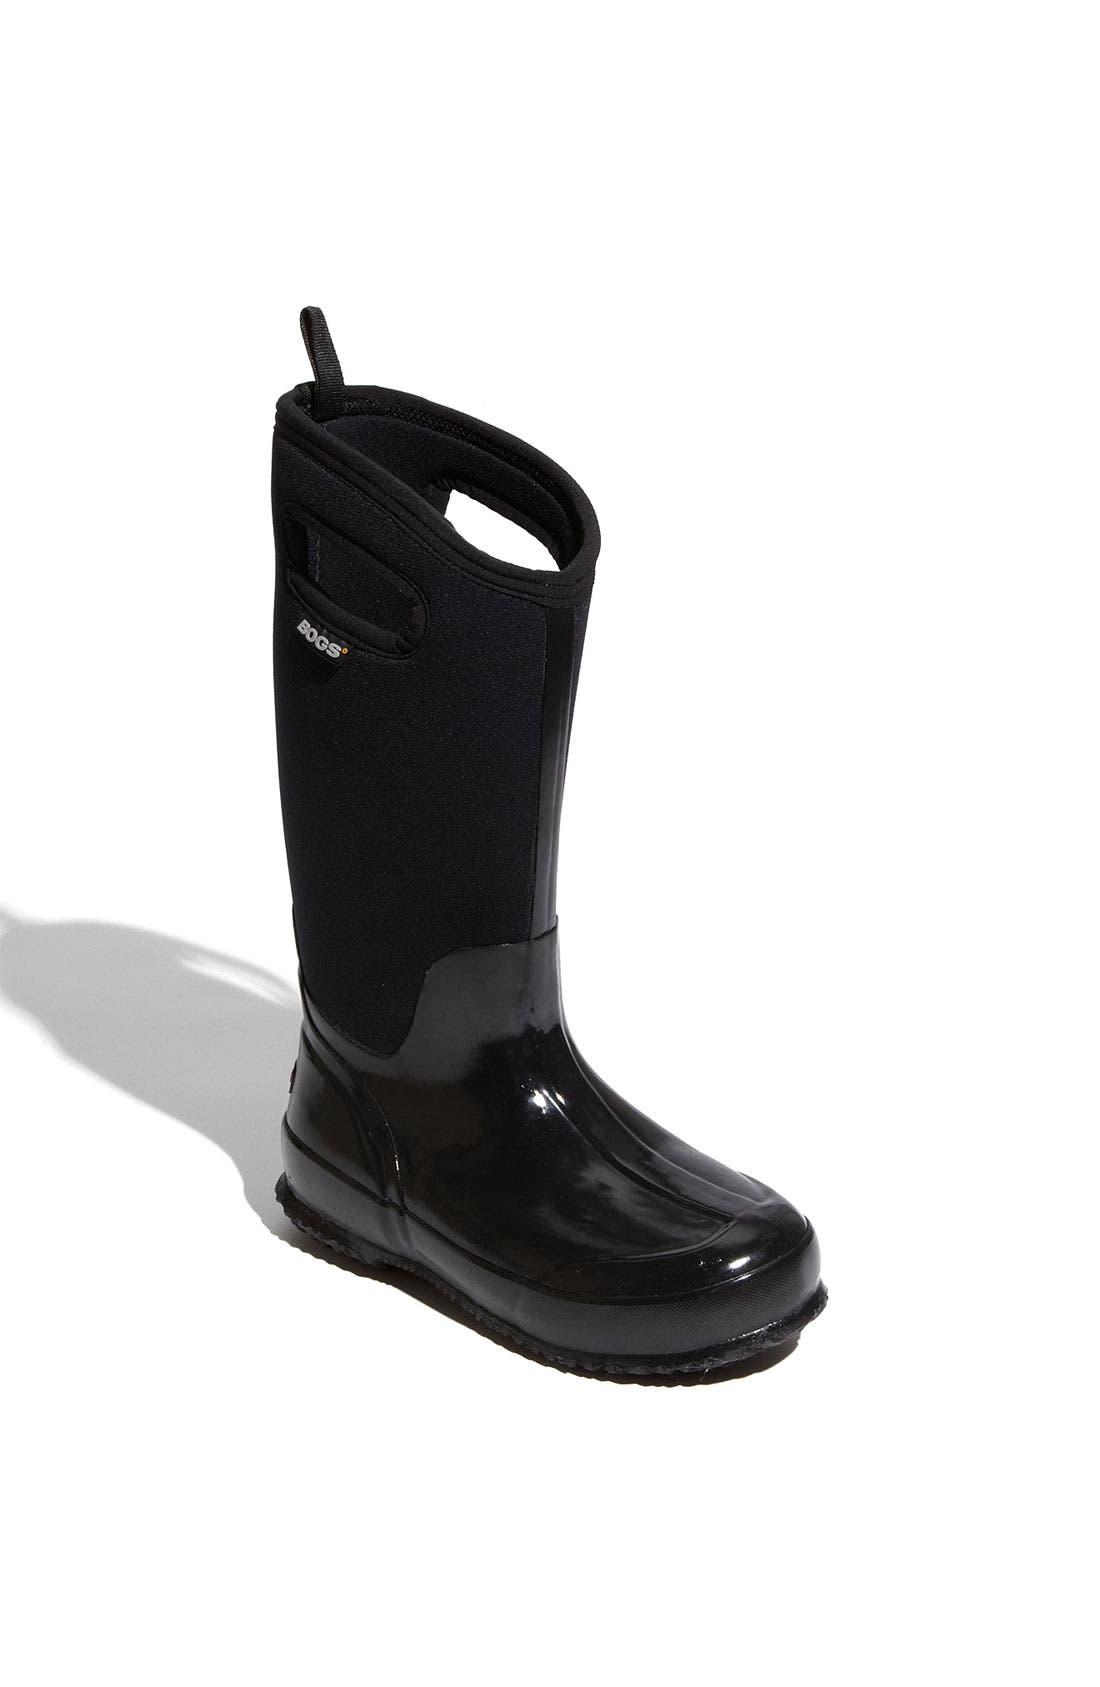 Bogs 'Classic' Tall Rain Boot (Women)